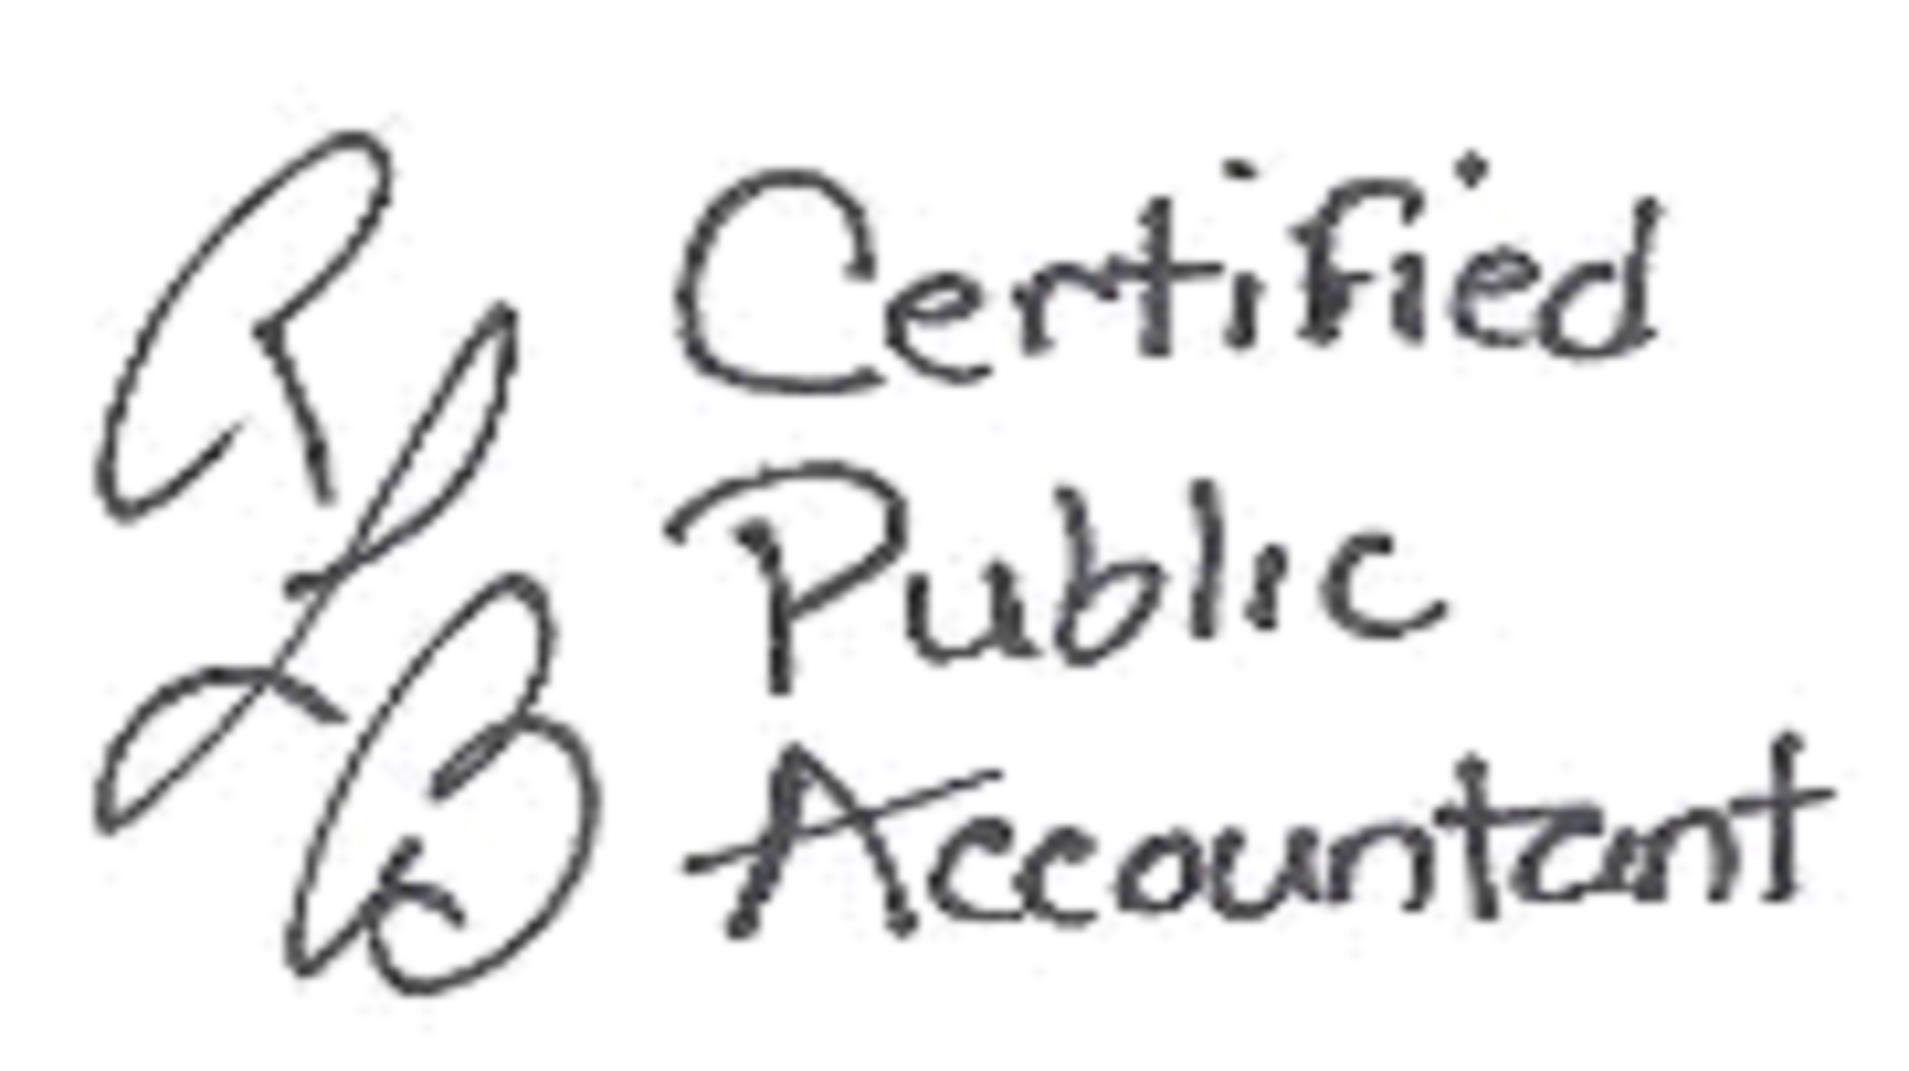 EDGAR Filing Documents for 0001640334-15-000108